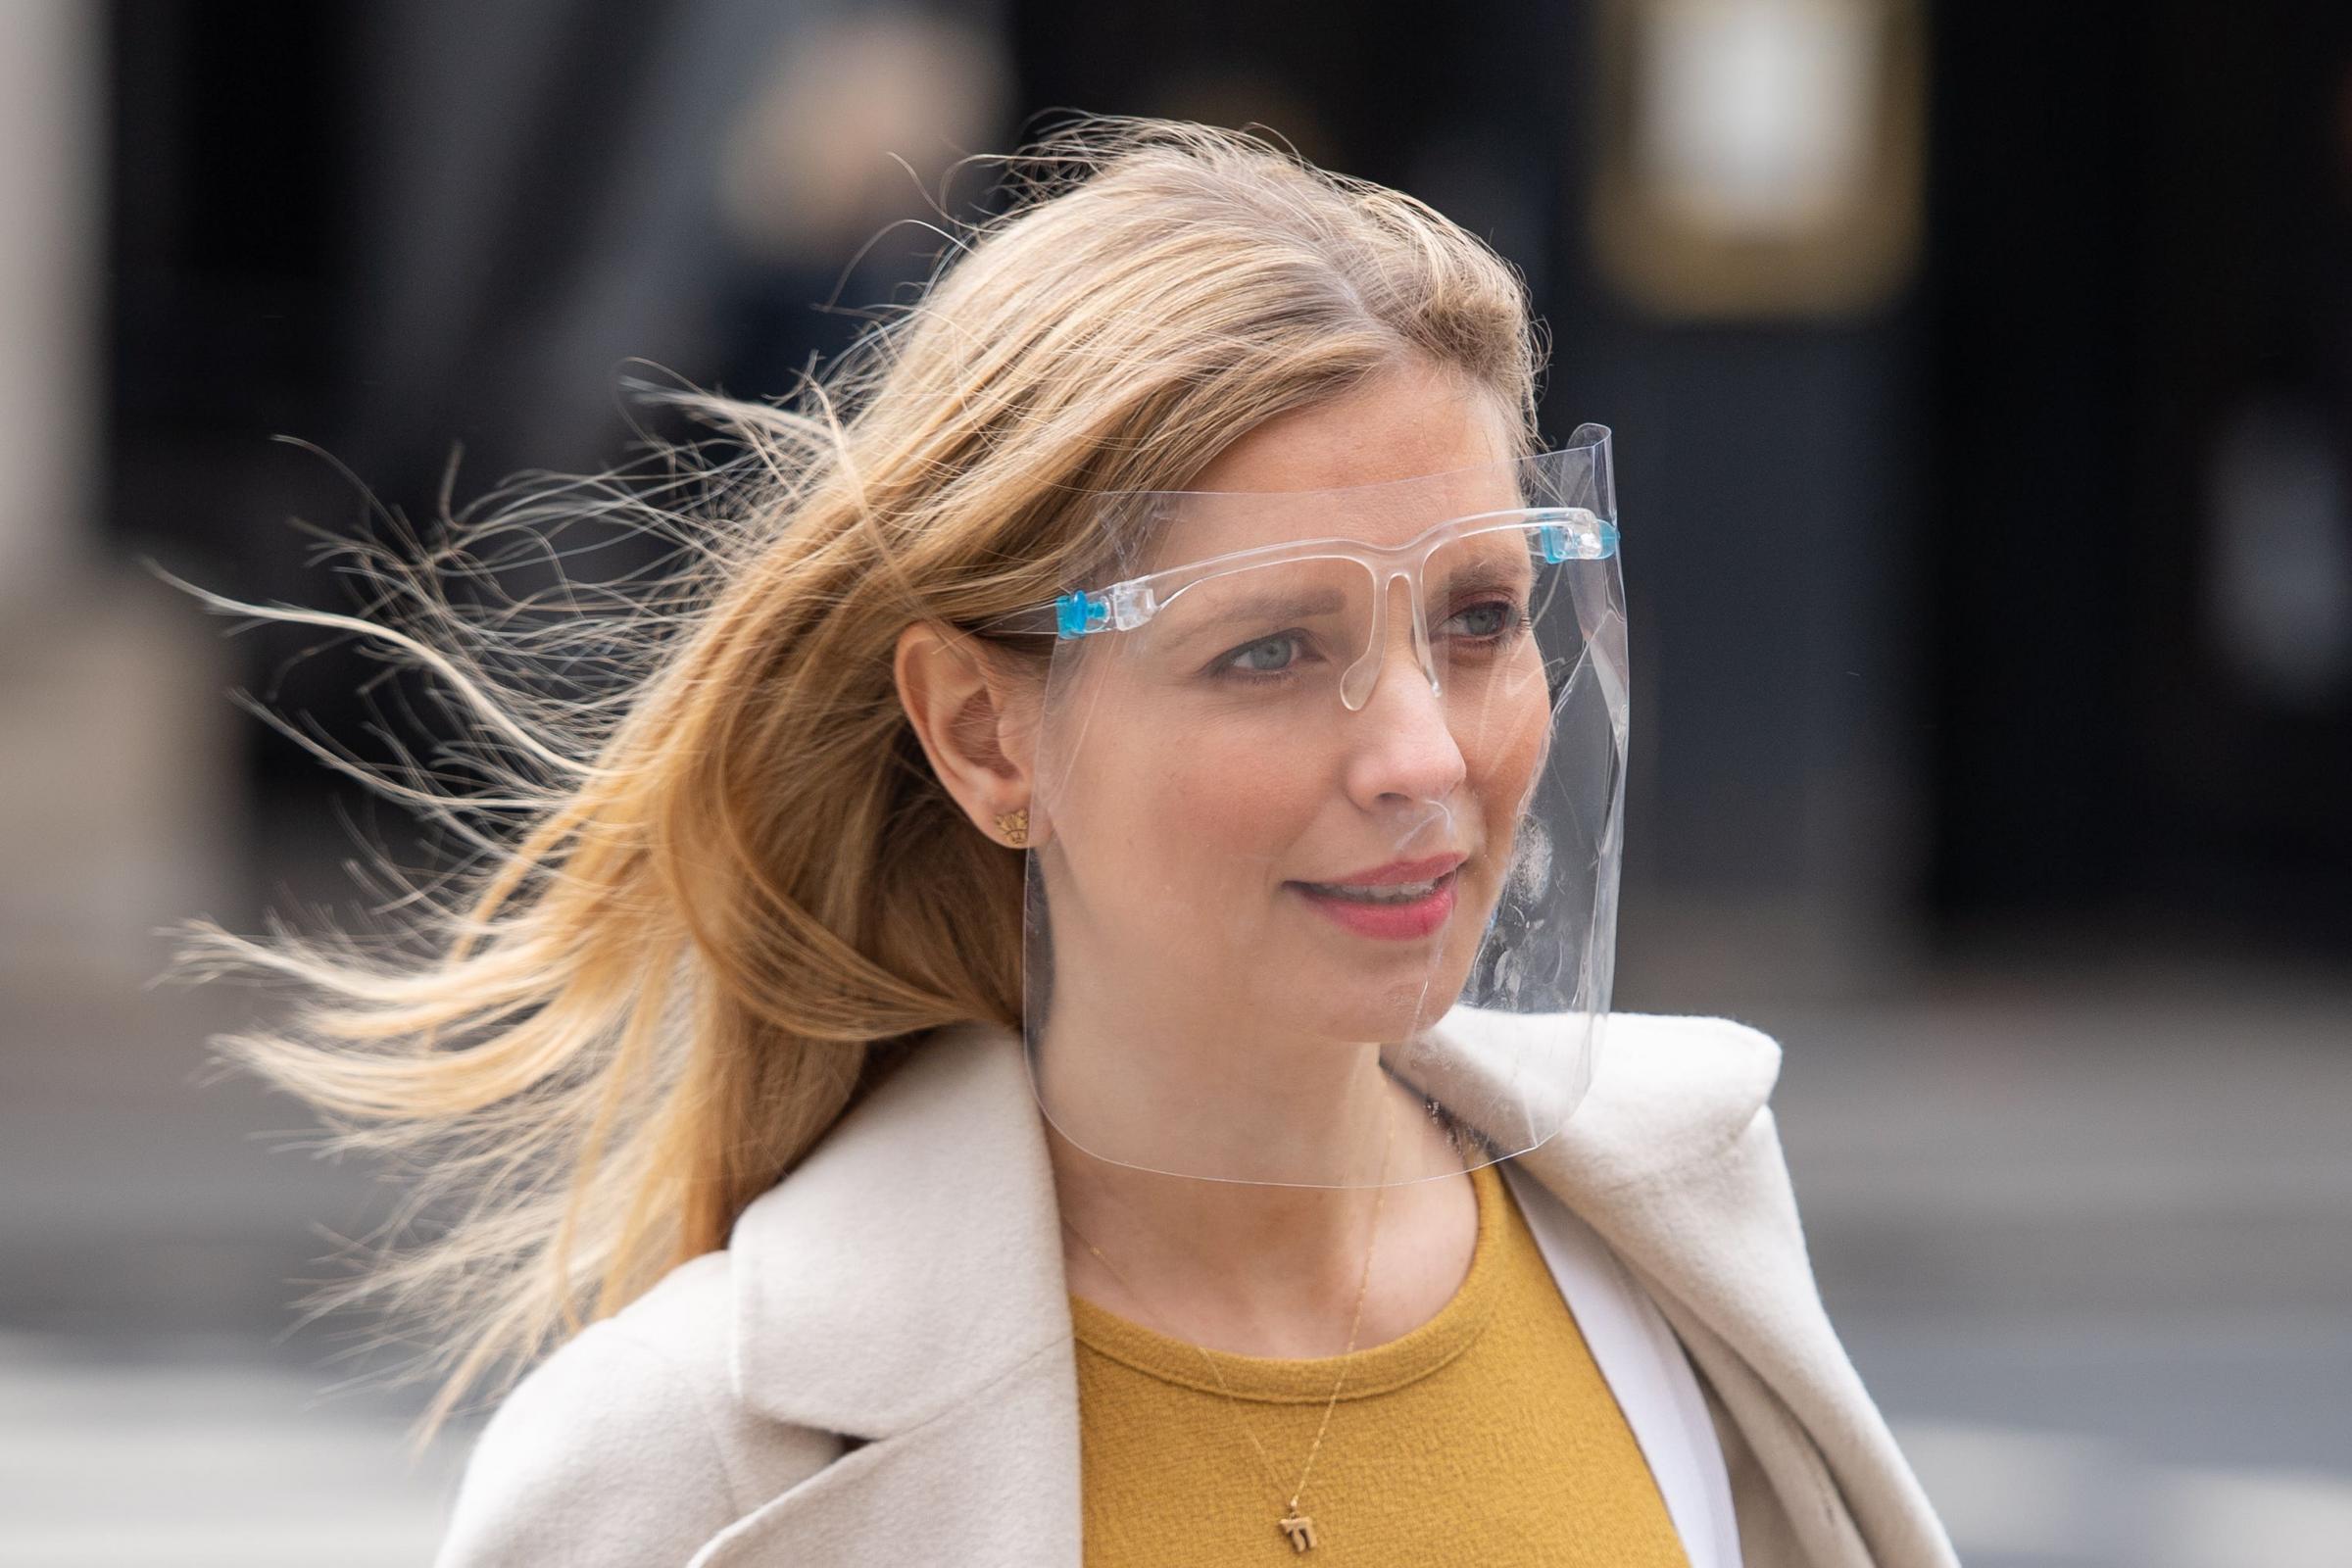 Rachel Riley tells judge former Corbyn aide was blowing a 'dog whistle'